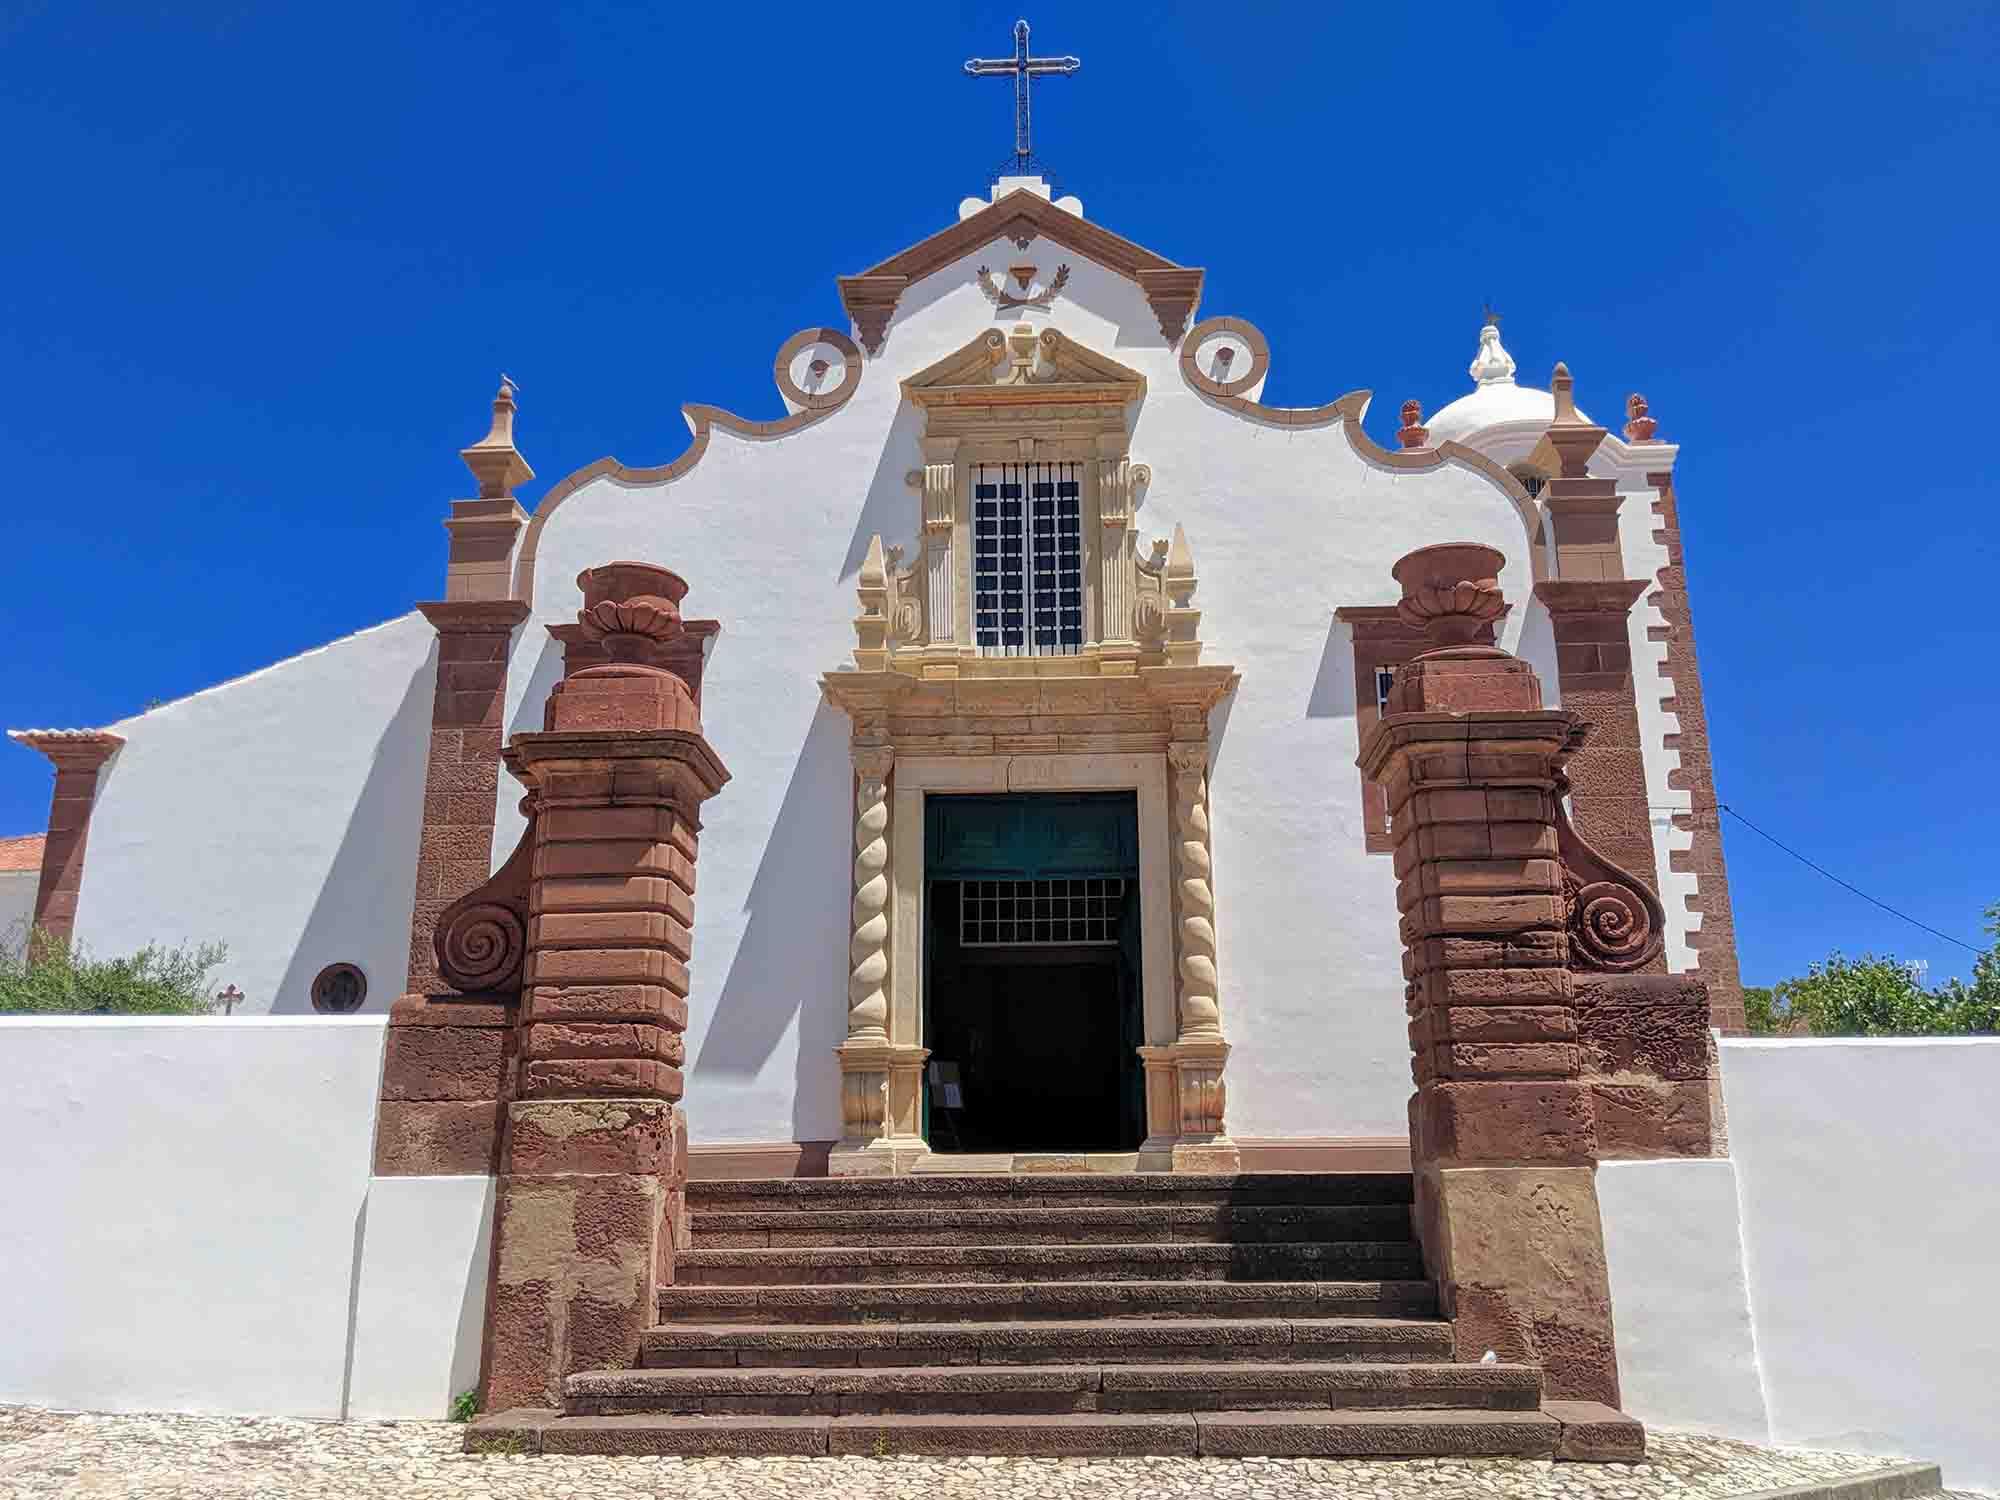 igreja sb messines front